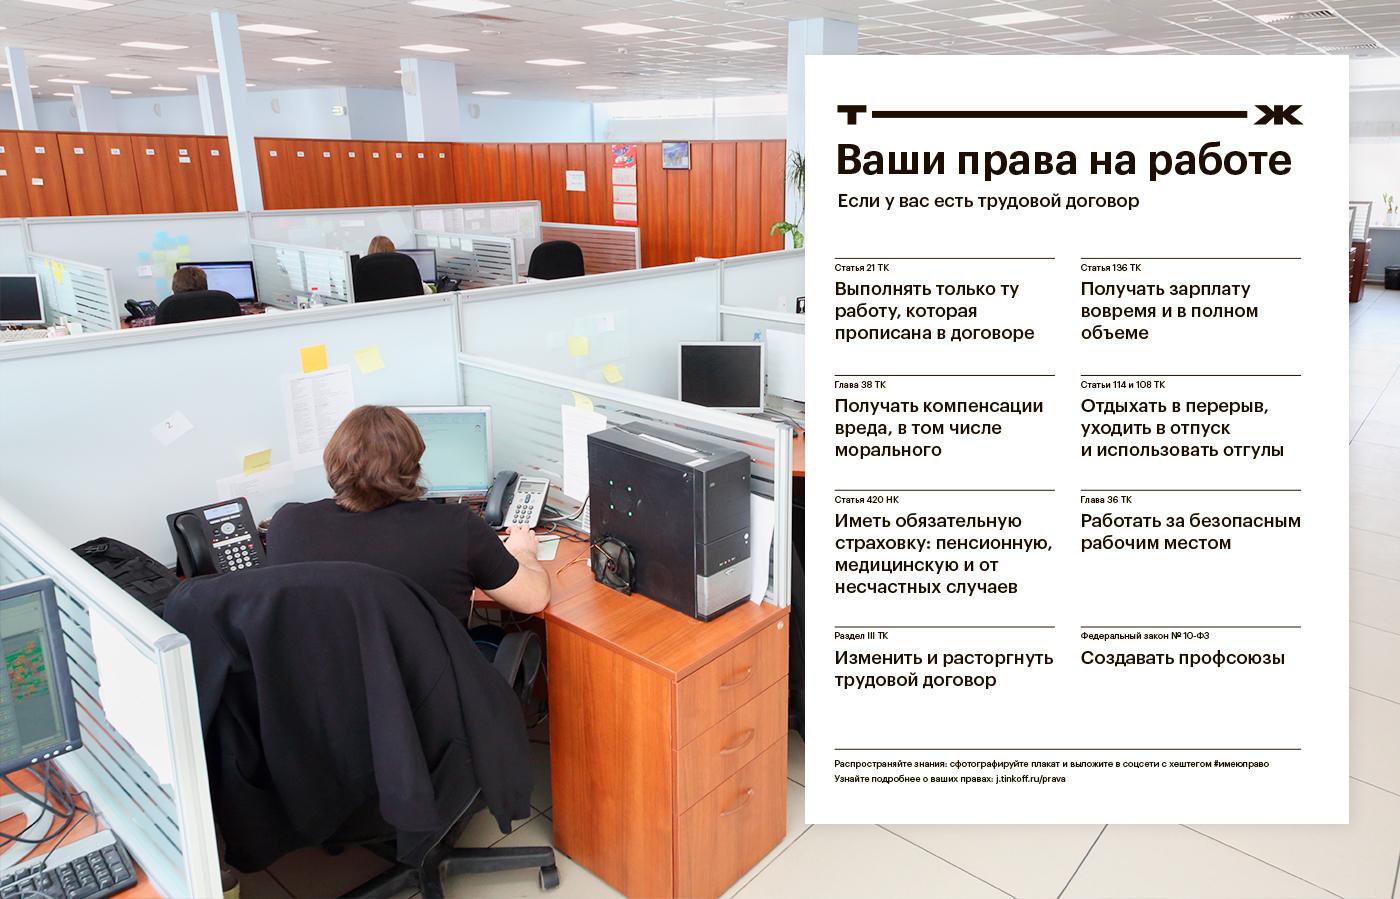 Ваши права на работе